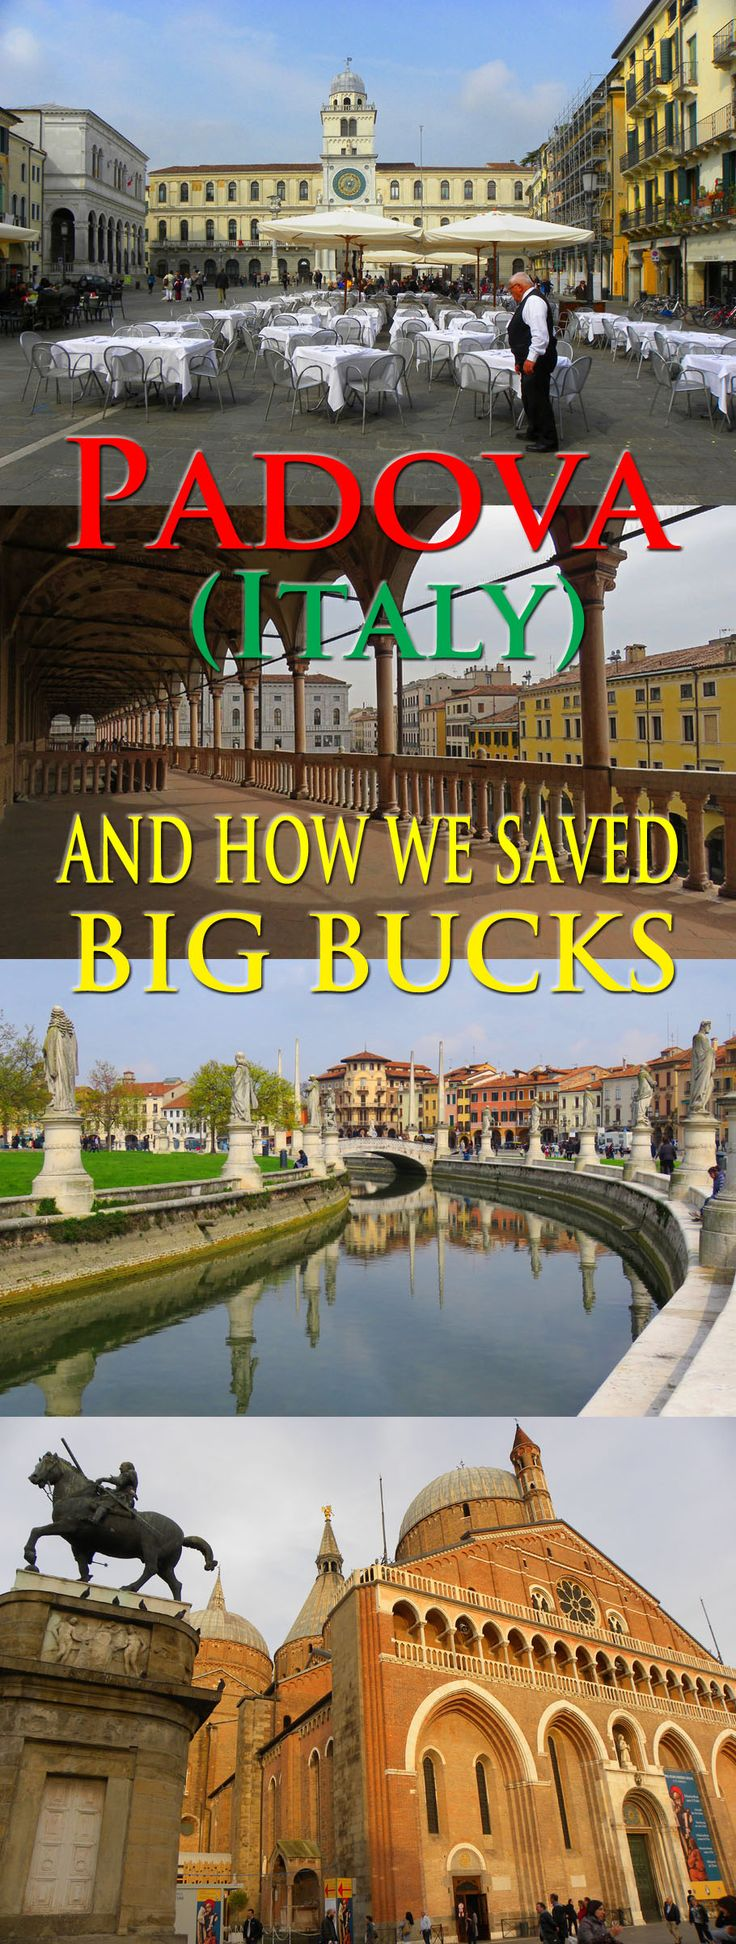 How we saved a lot of money using Padova (Padua) as a base in the Veneto region: http://bbqboy.net/padova-padua-italy-saved-big-bucks-airbnb-using-base-veneto-region/  #padova #padua #italy